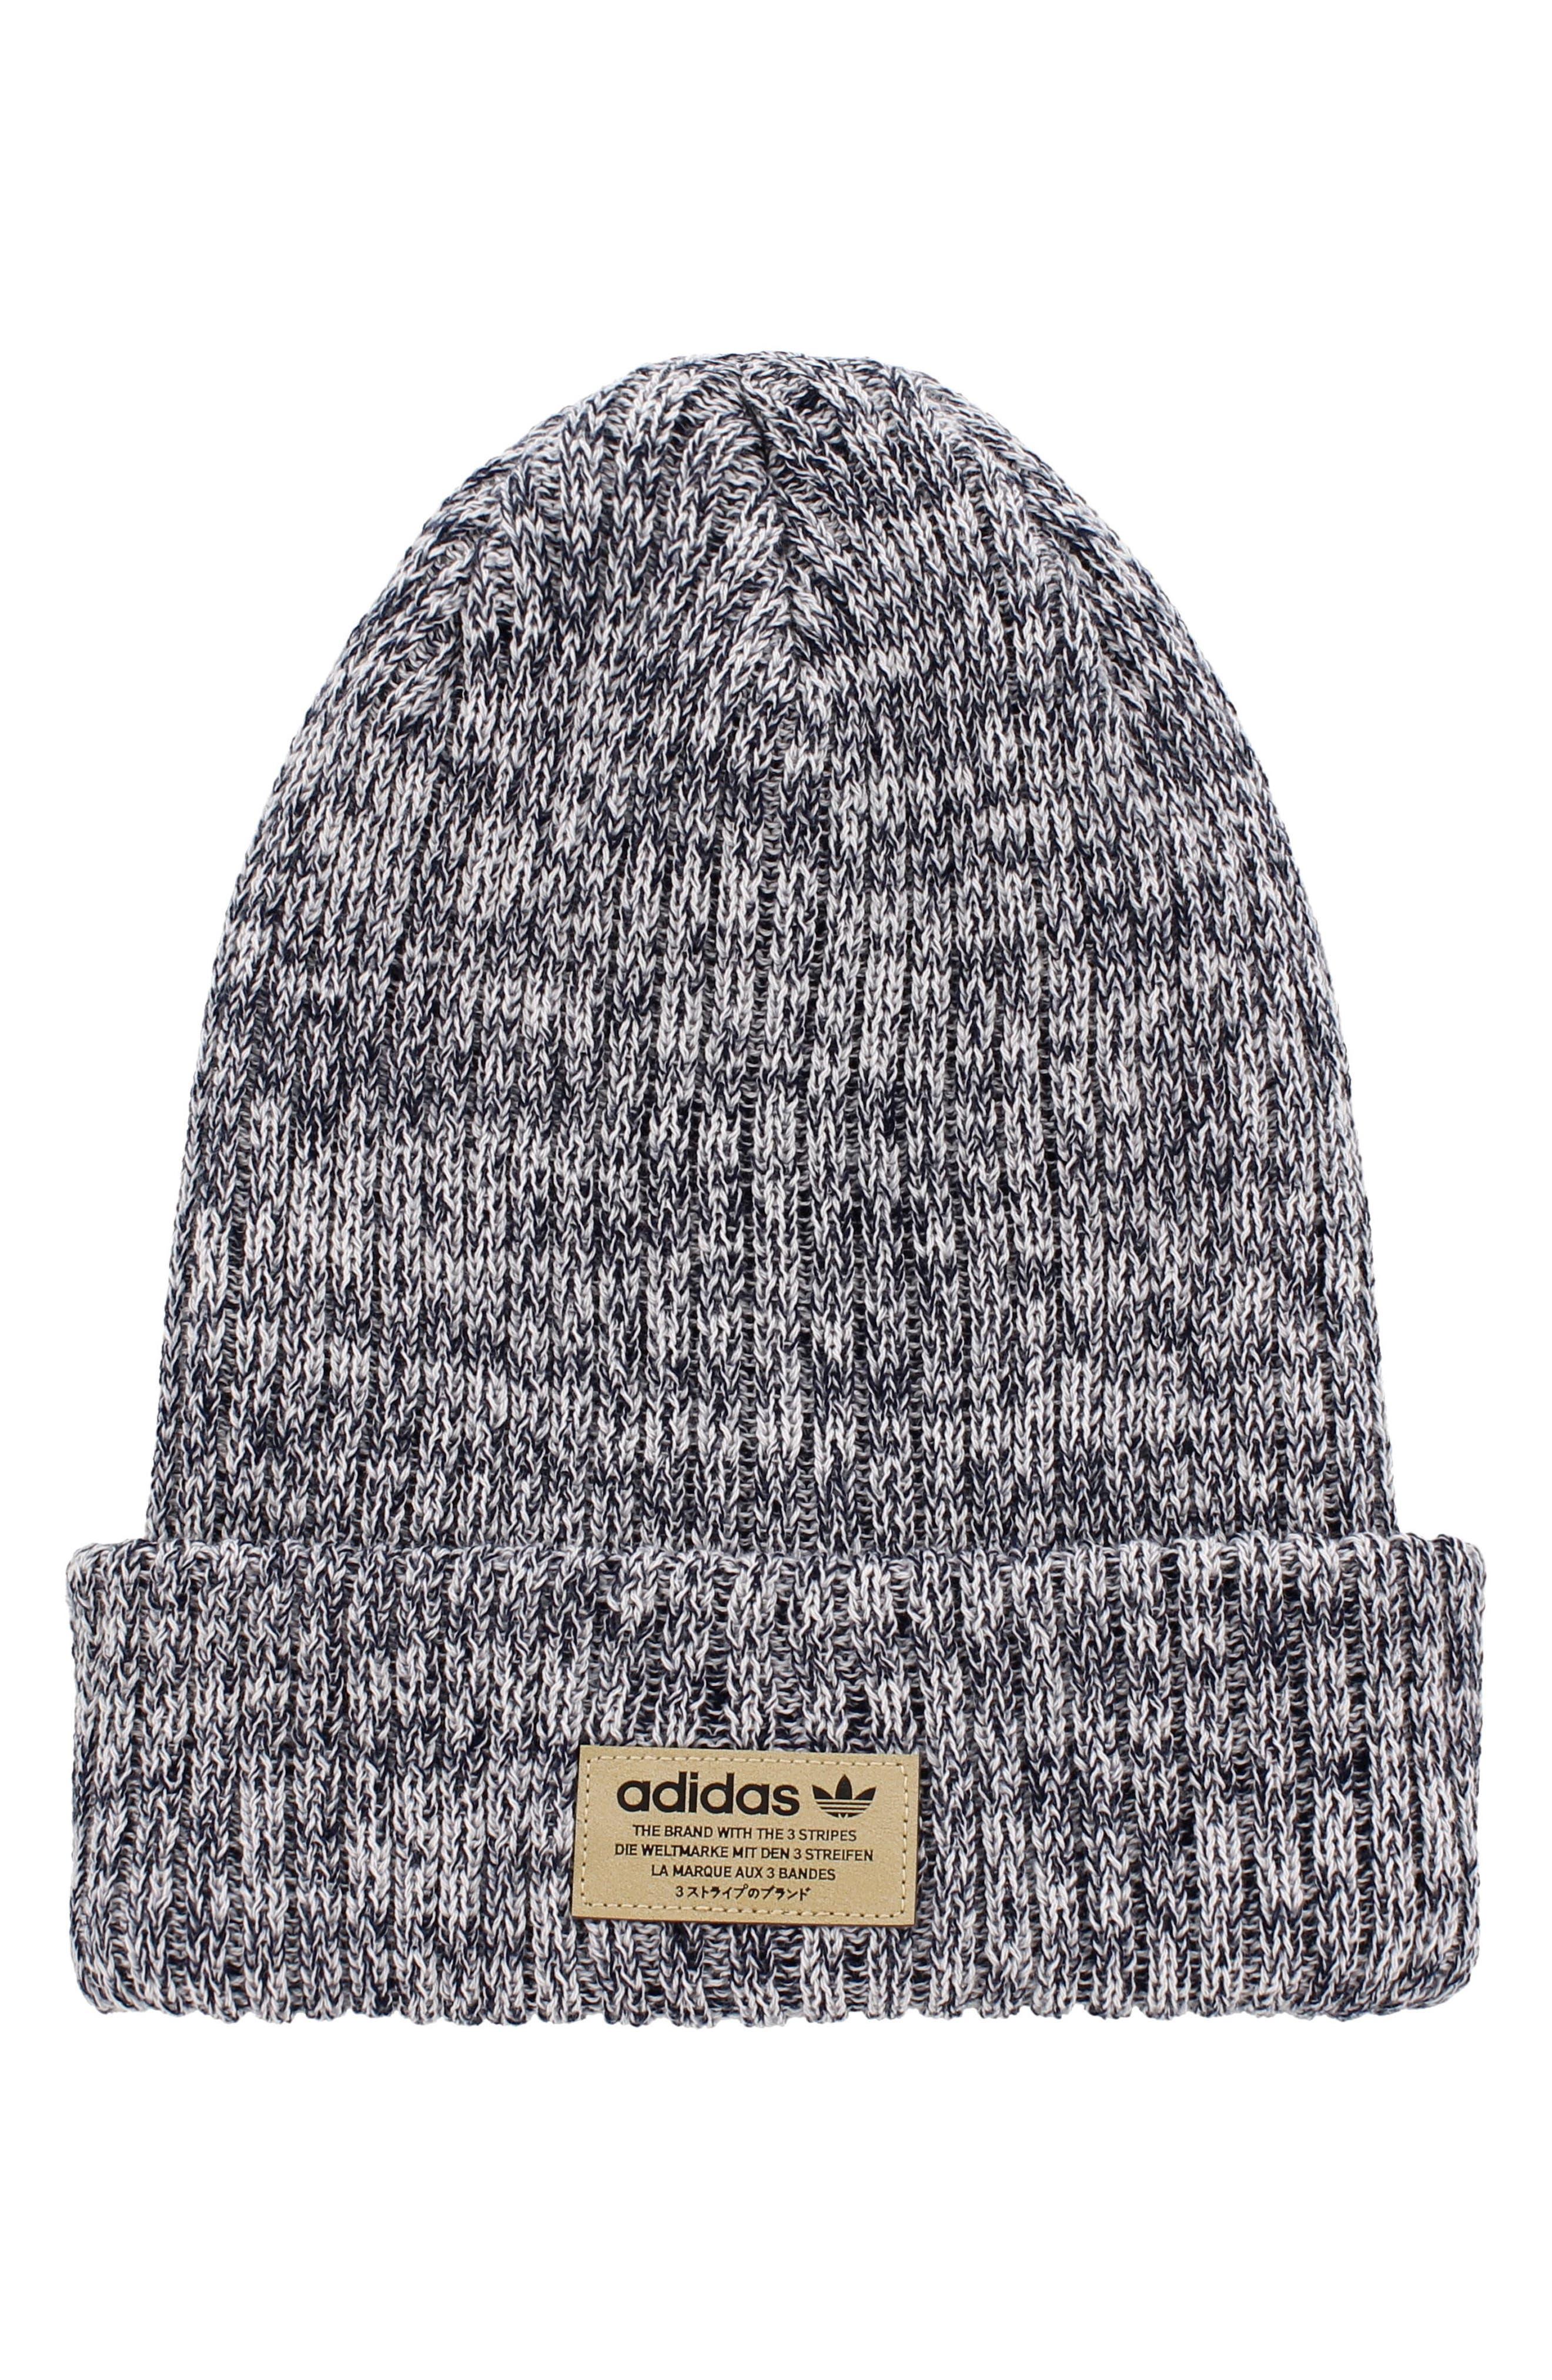 Main Image - adidas Originals NMD Knit Cap